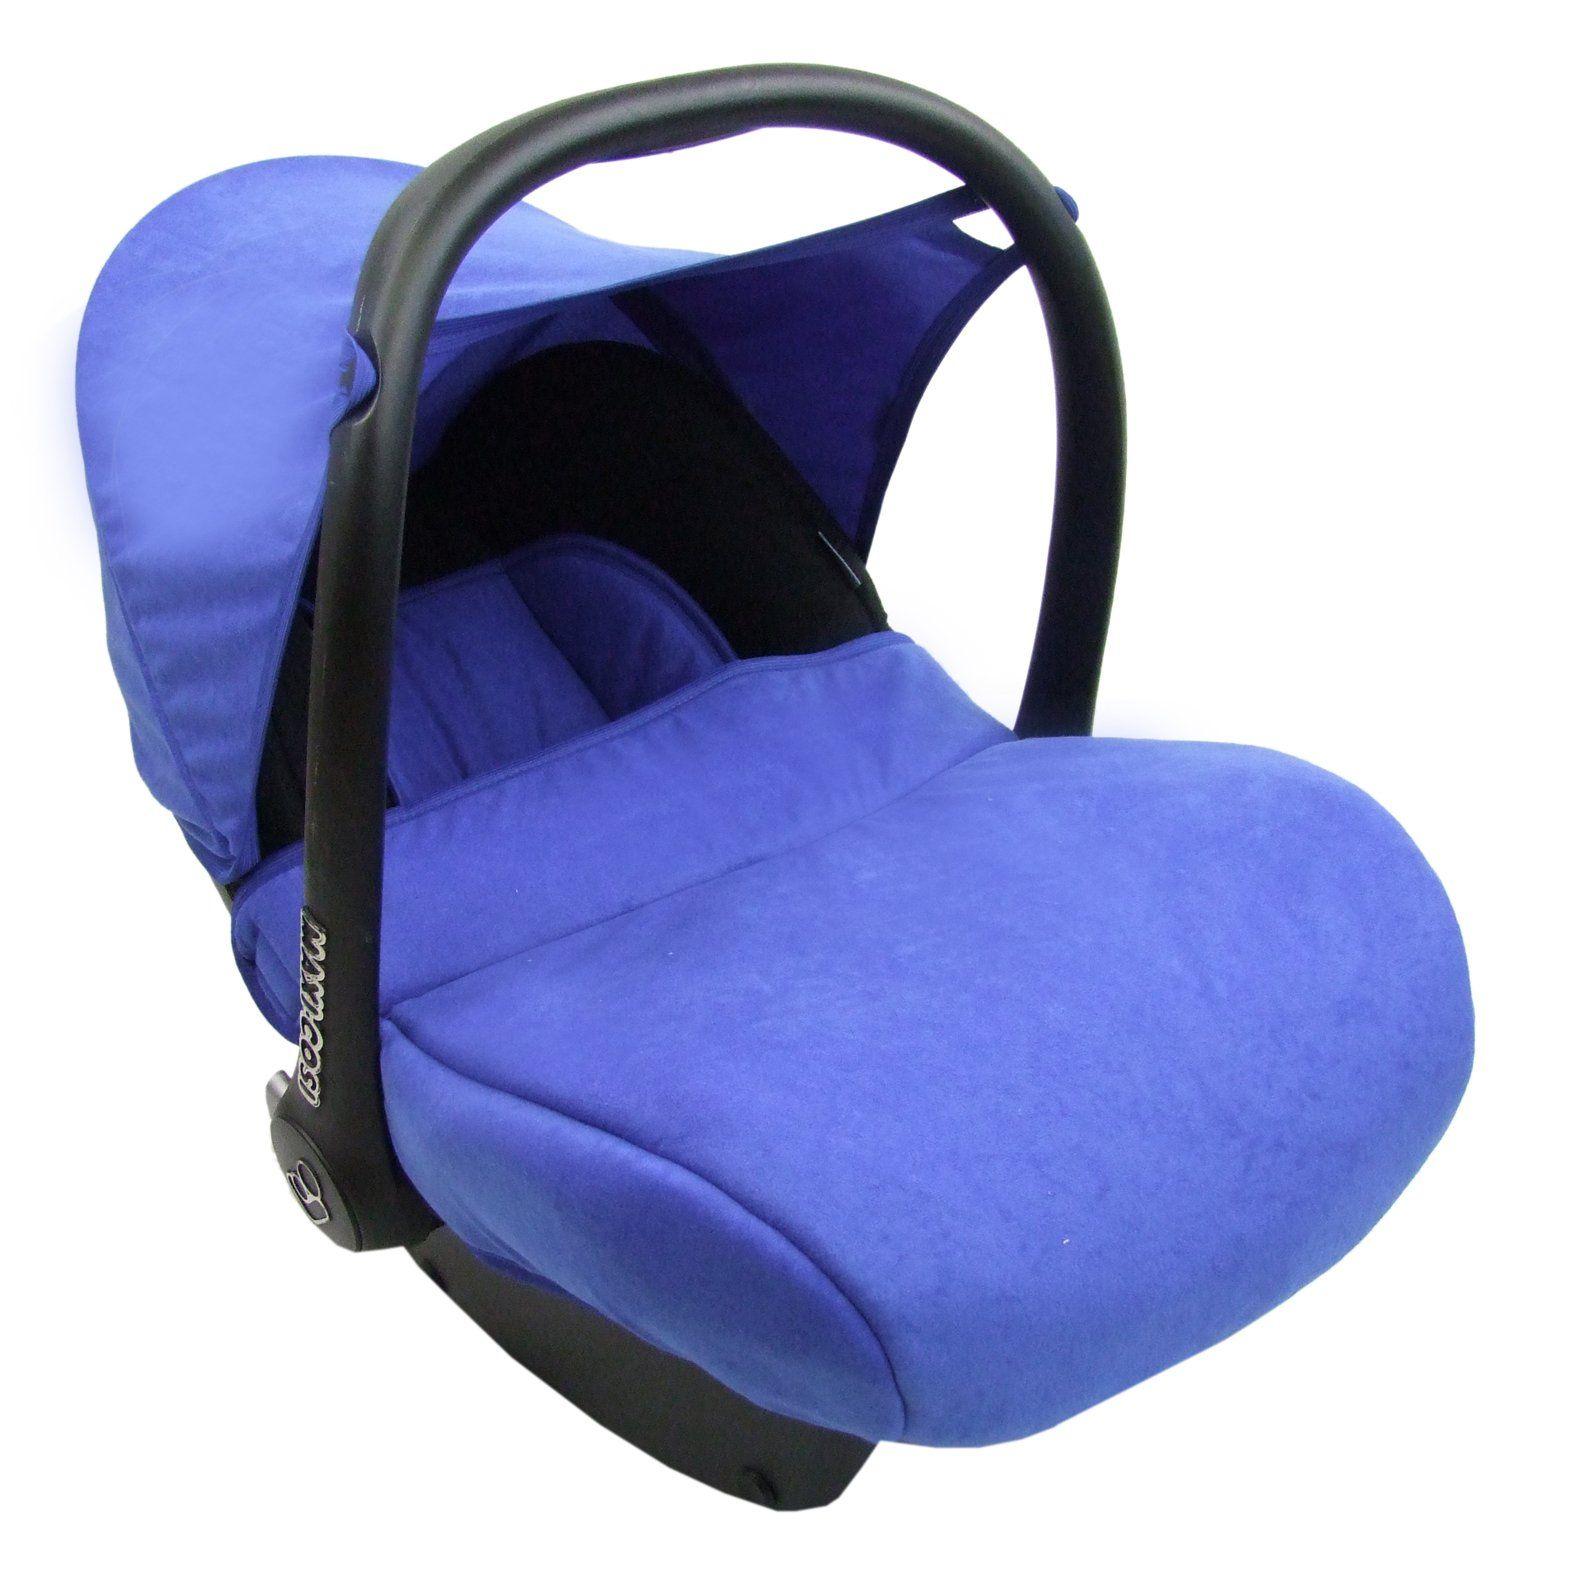 Bambiniwelt Kompl Ersatzbezug Fur Maxi Cosi Cabriofix 7 Tlg Bezug Fur Babyschale Sommerbezug Cabrio Fix Marine Blau In 2020 Baby Car Seats Baby Car Car Seats